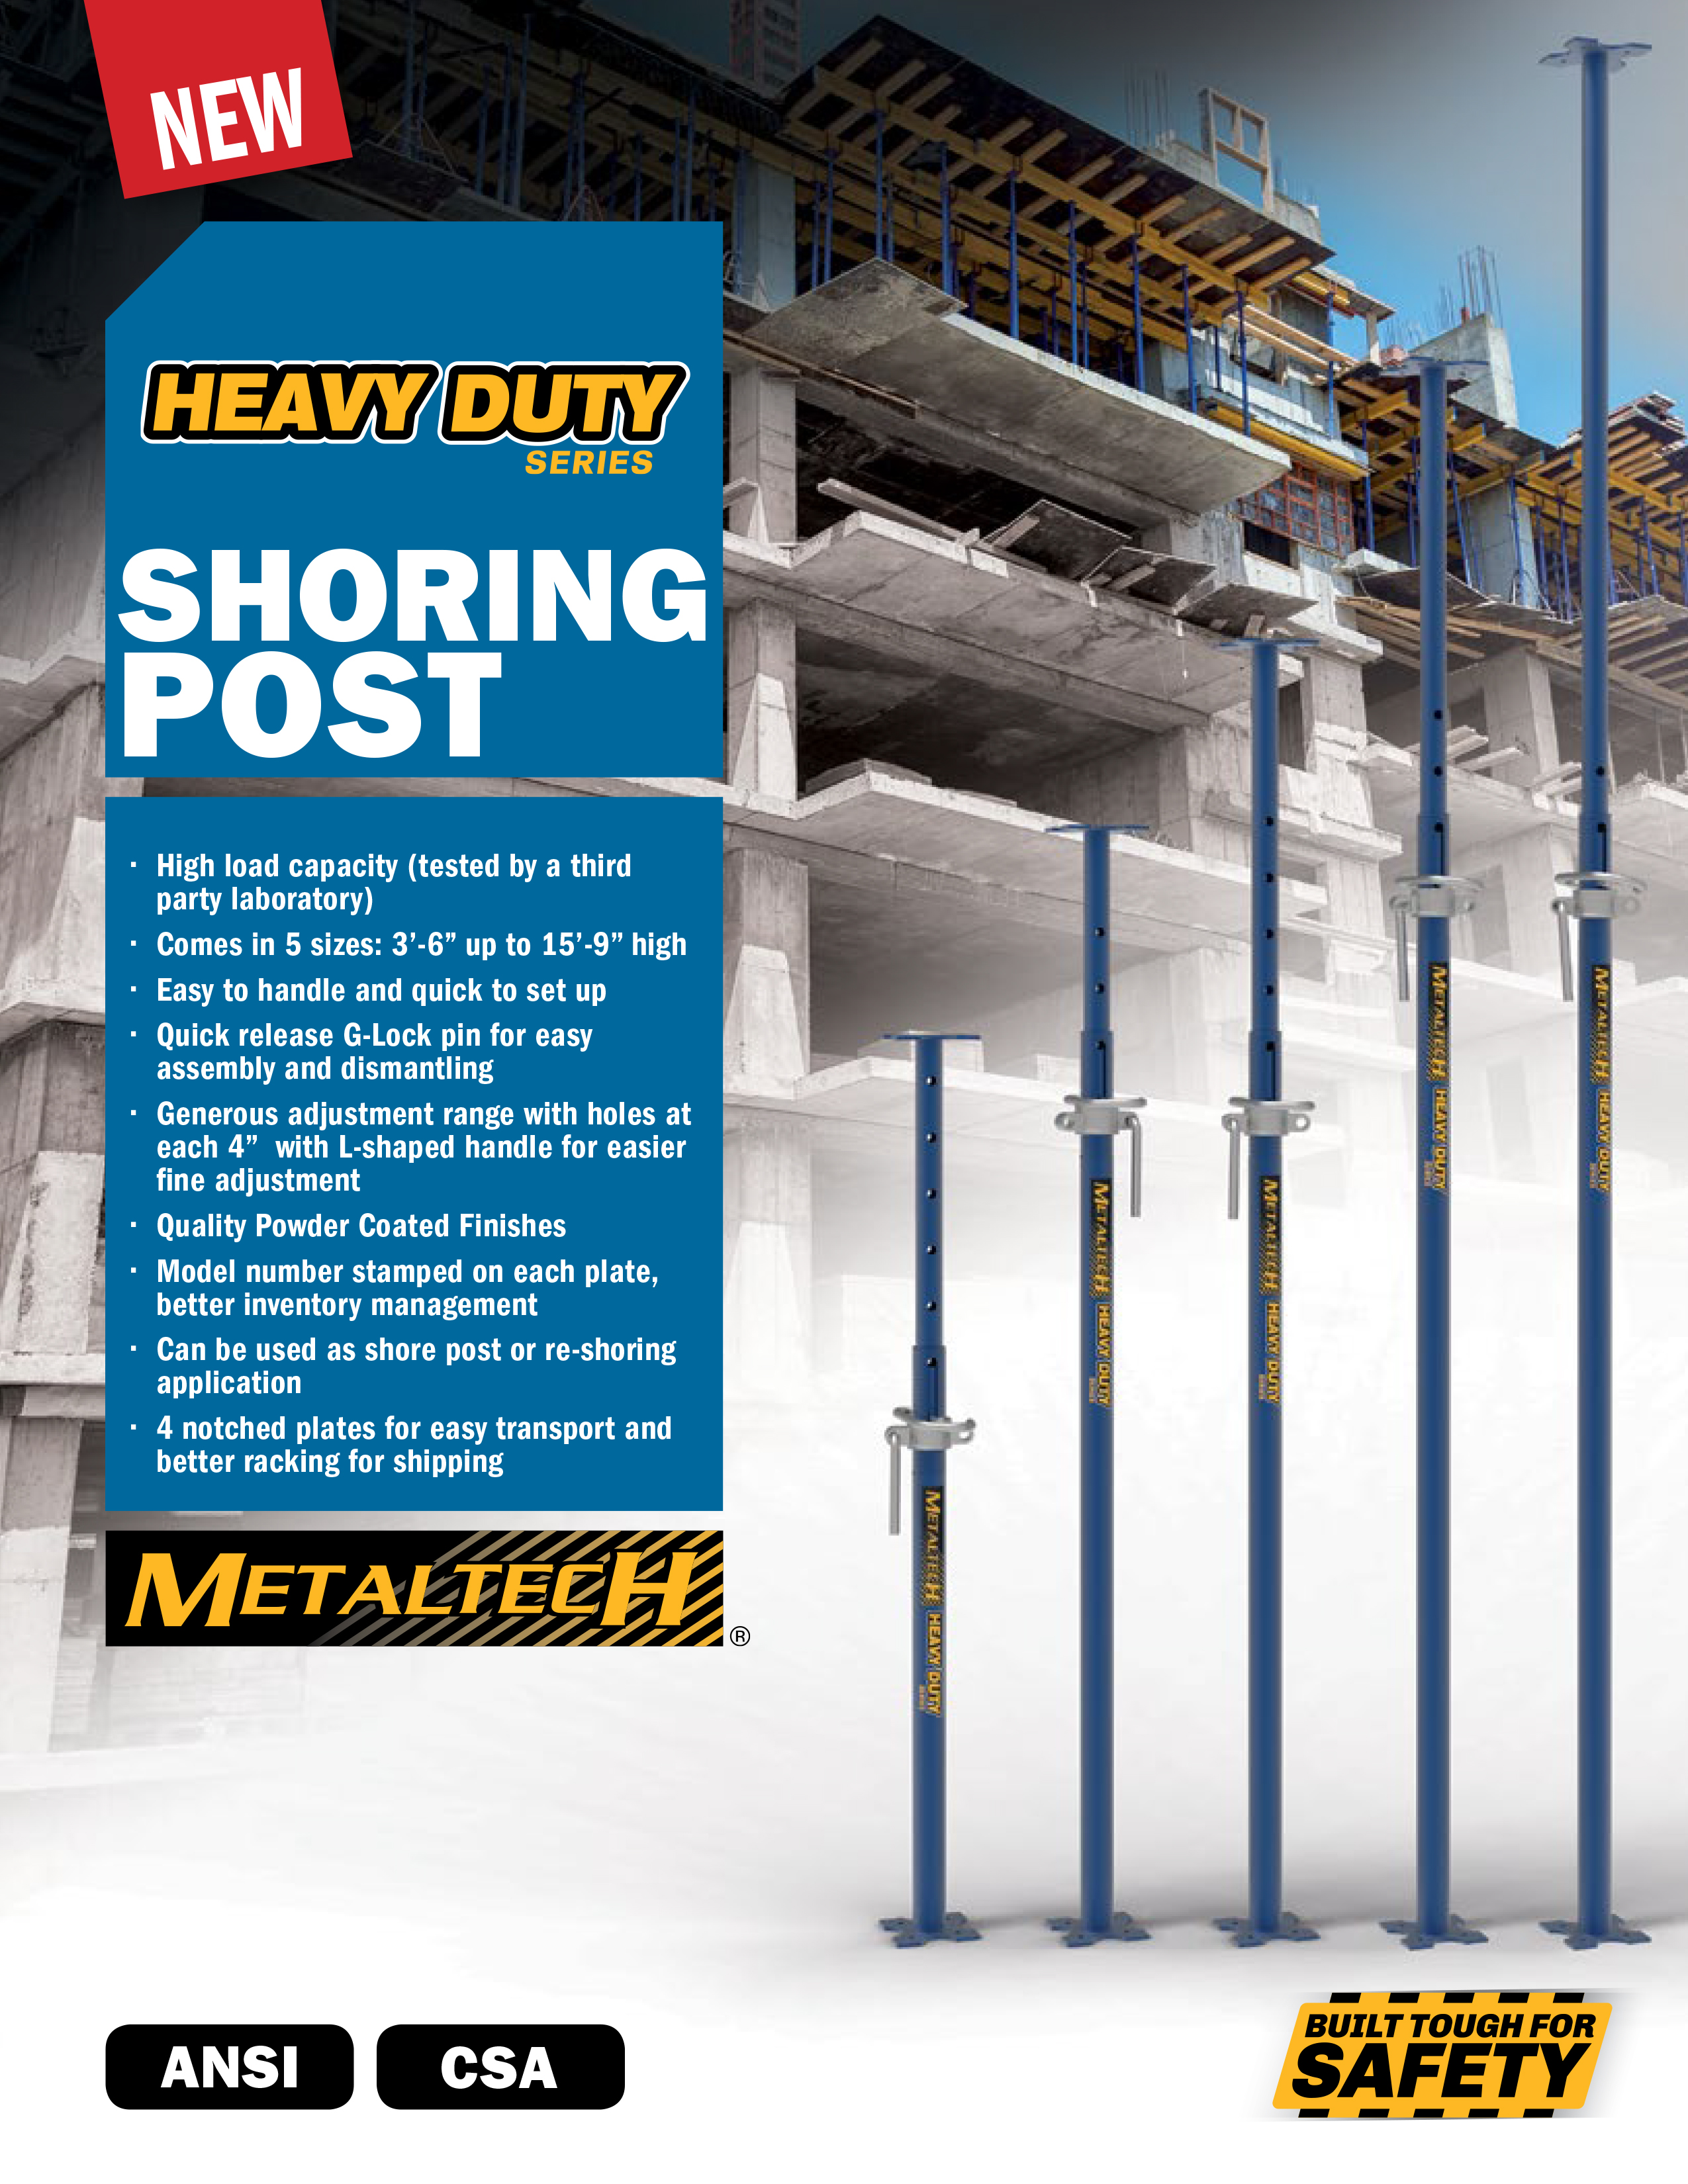 metaltech-shoring-post-1.jpg